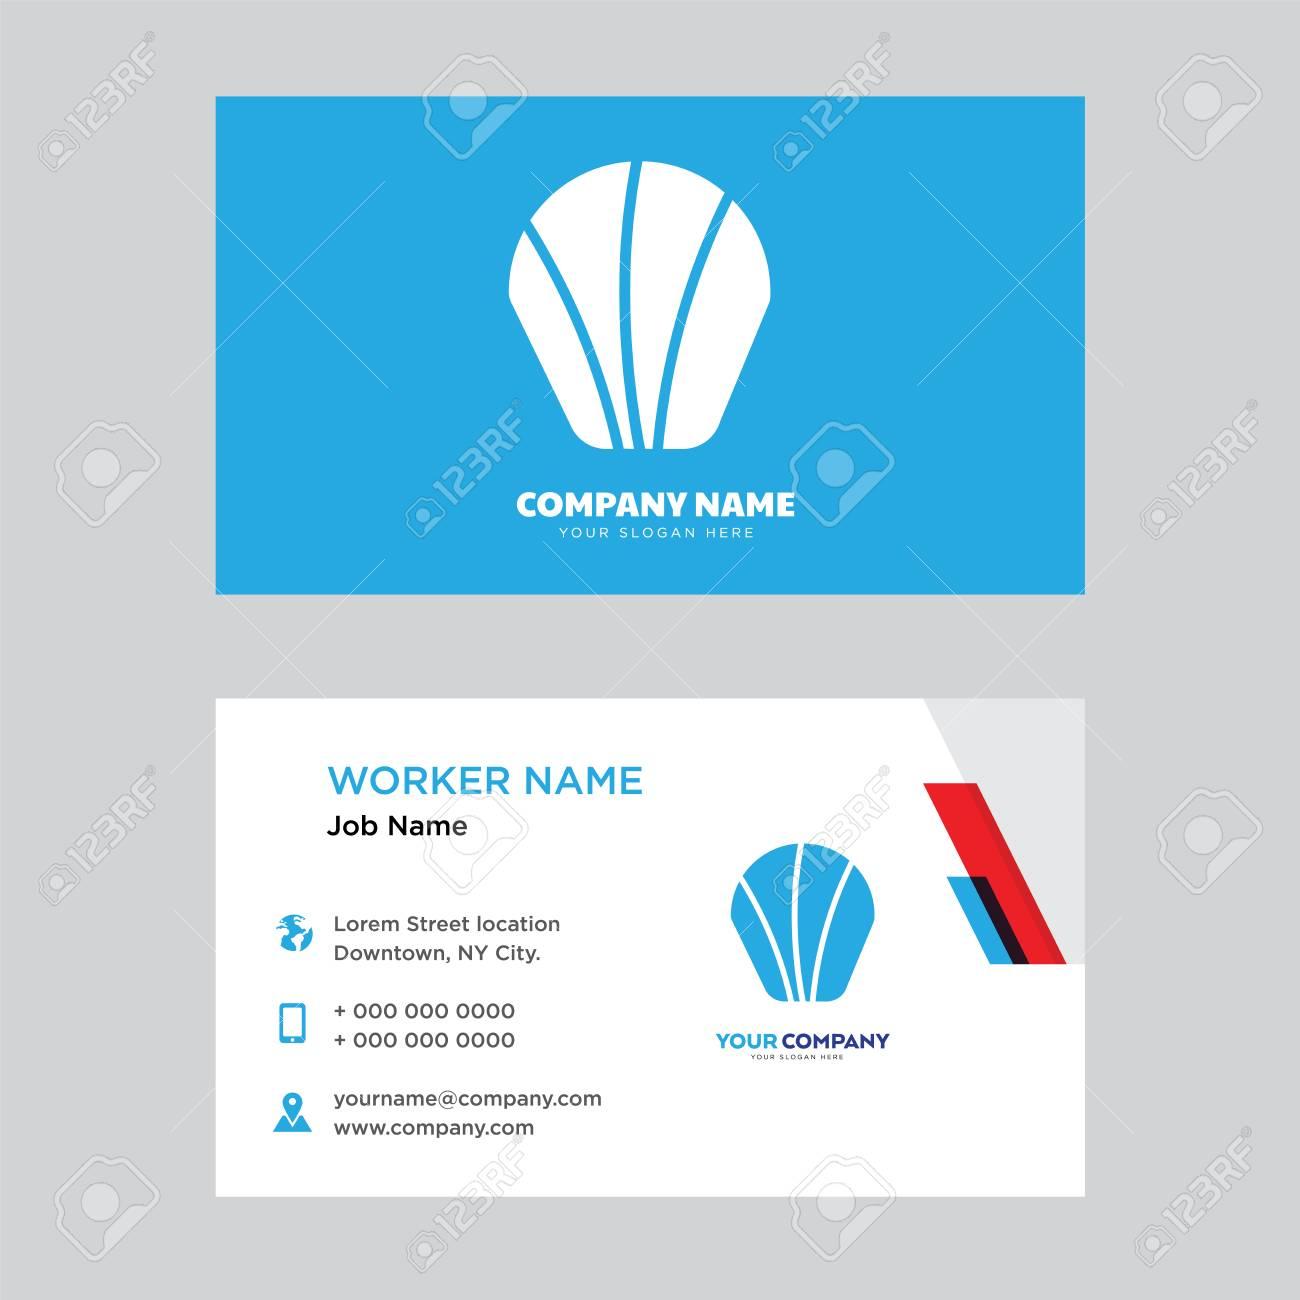 Sea shell business card design template visiting for your company sea shell business card design template visiting for your company modern horizontal identity card colourmoves